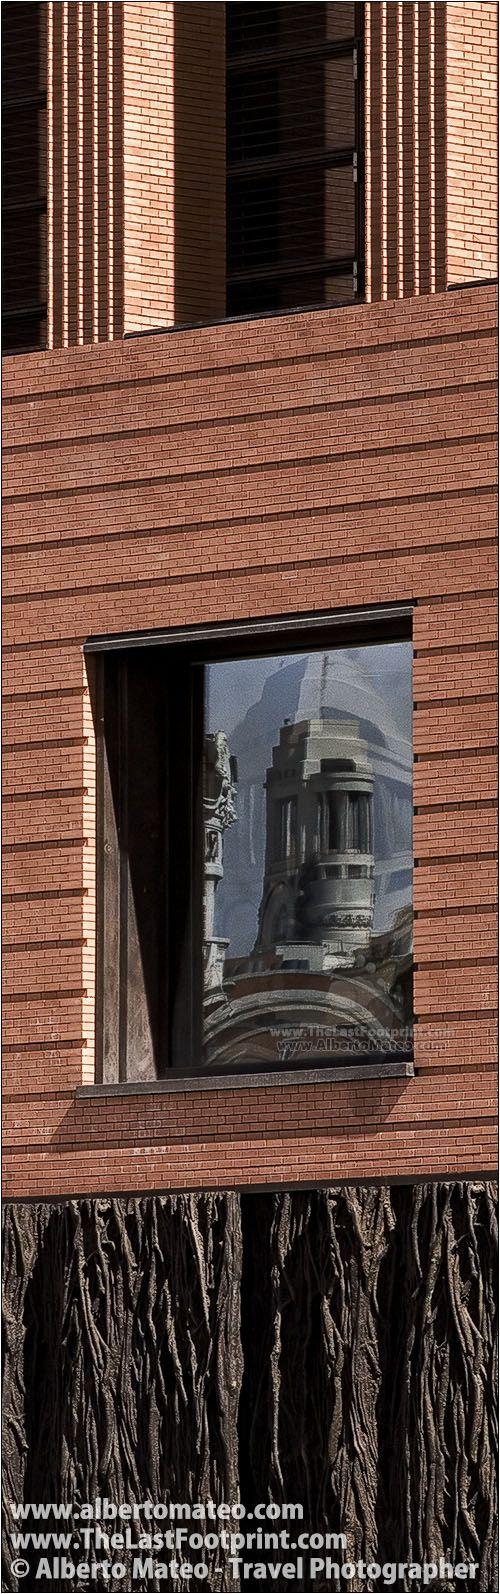 Circulo de Bellas Artes tower reflected on the Prado Museum new building, Paseo del Prado, Madrid, Spain. | Cityscape by Alberto Mateo, Travel Photographer.